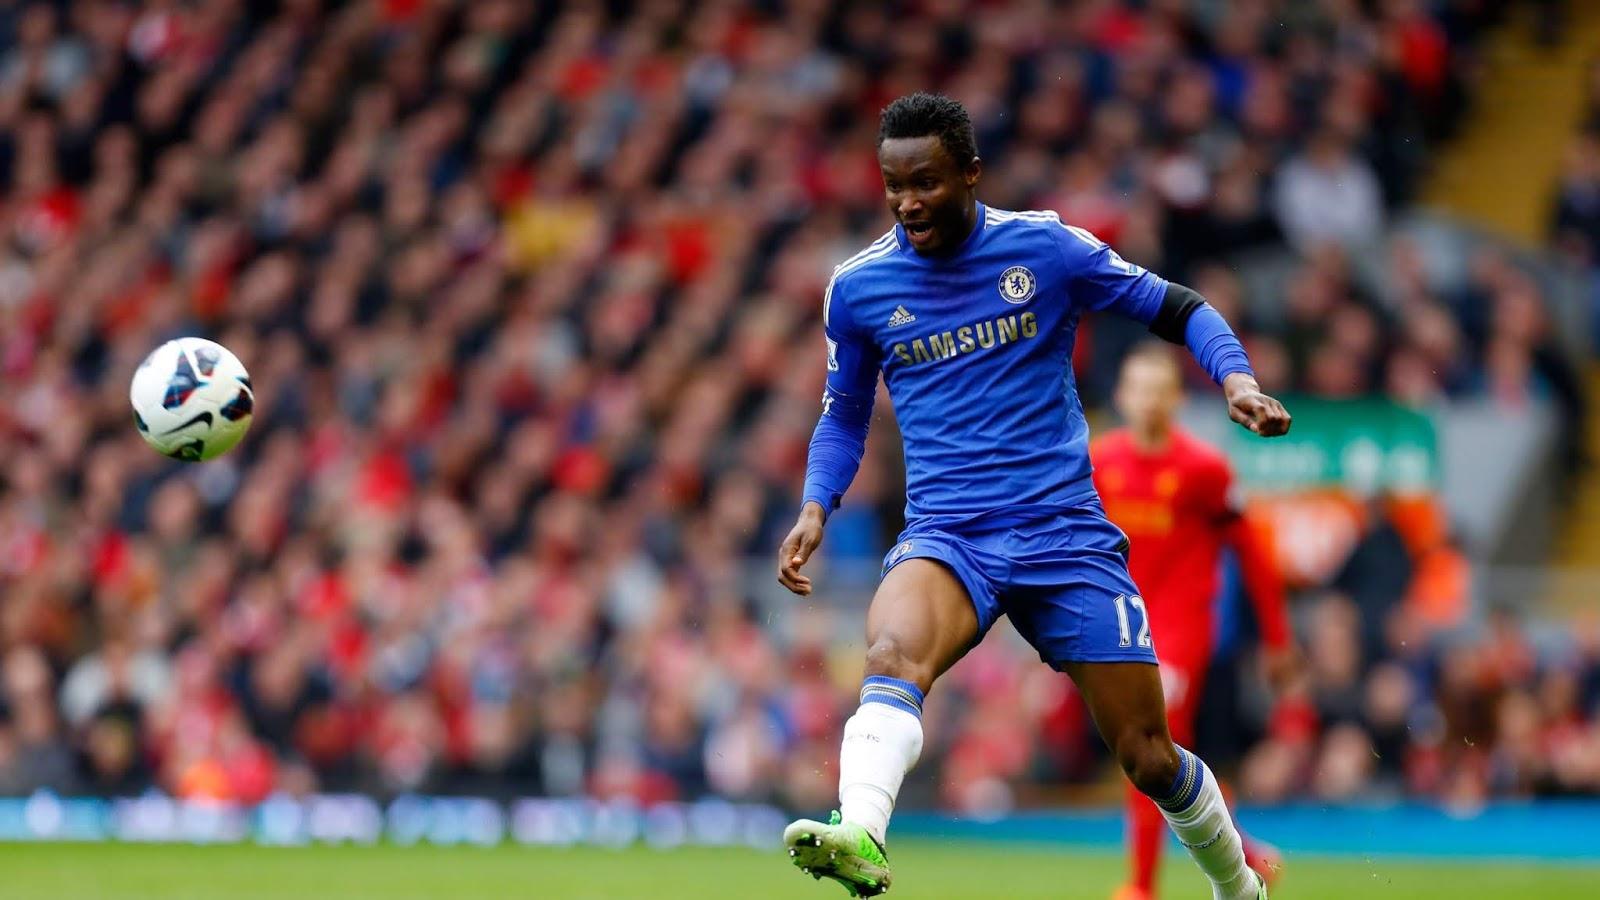 Rangers should make big move for former Chelsea star….